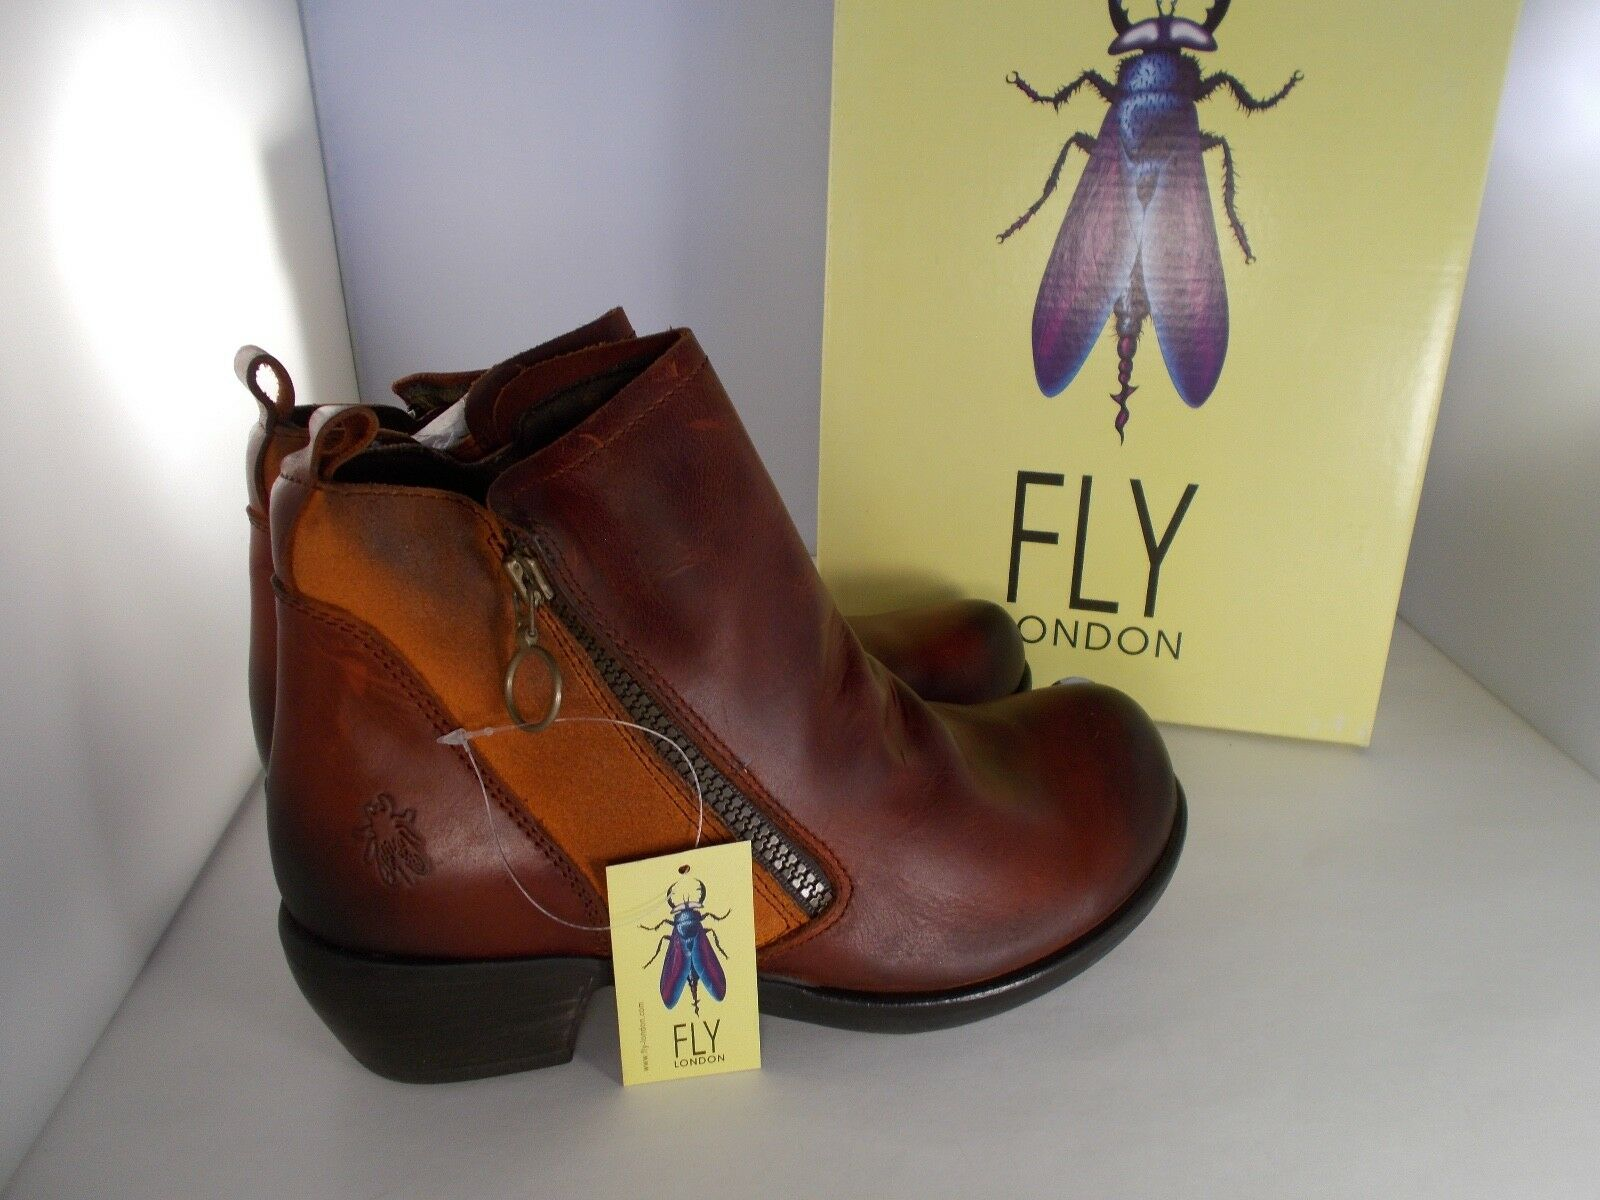 FLY London London London Meli Casual Ankle Boots Brick Rug Oil Suede Women's Size 9-9.5 US NIB 4e595e